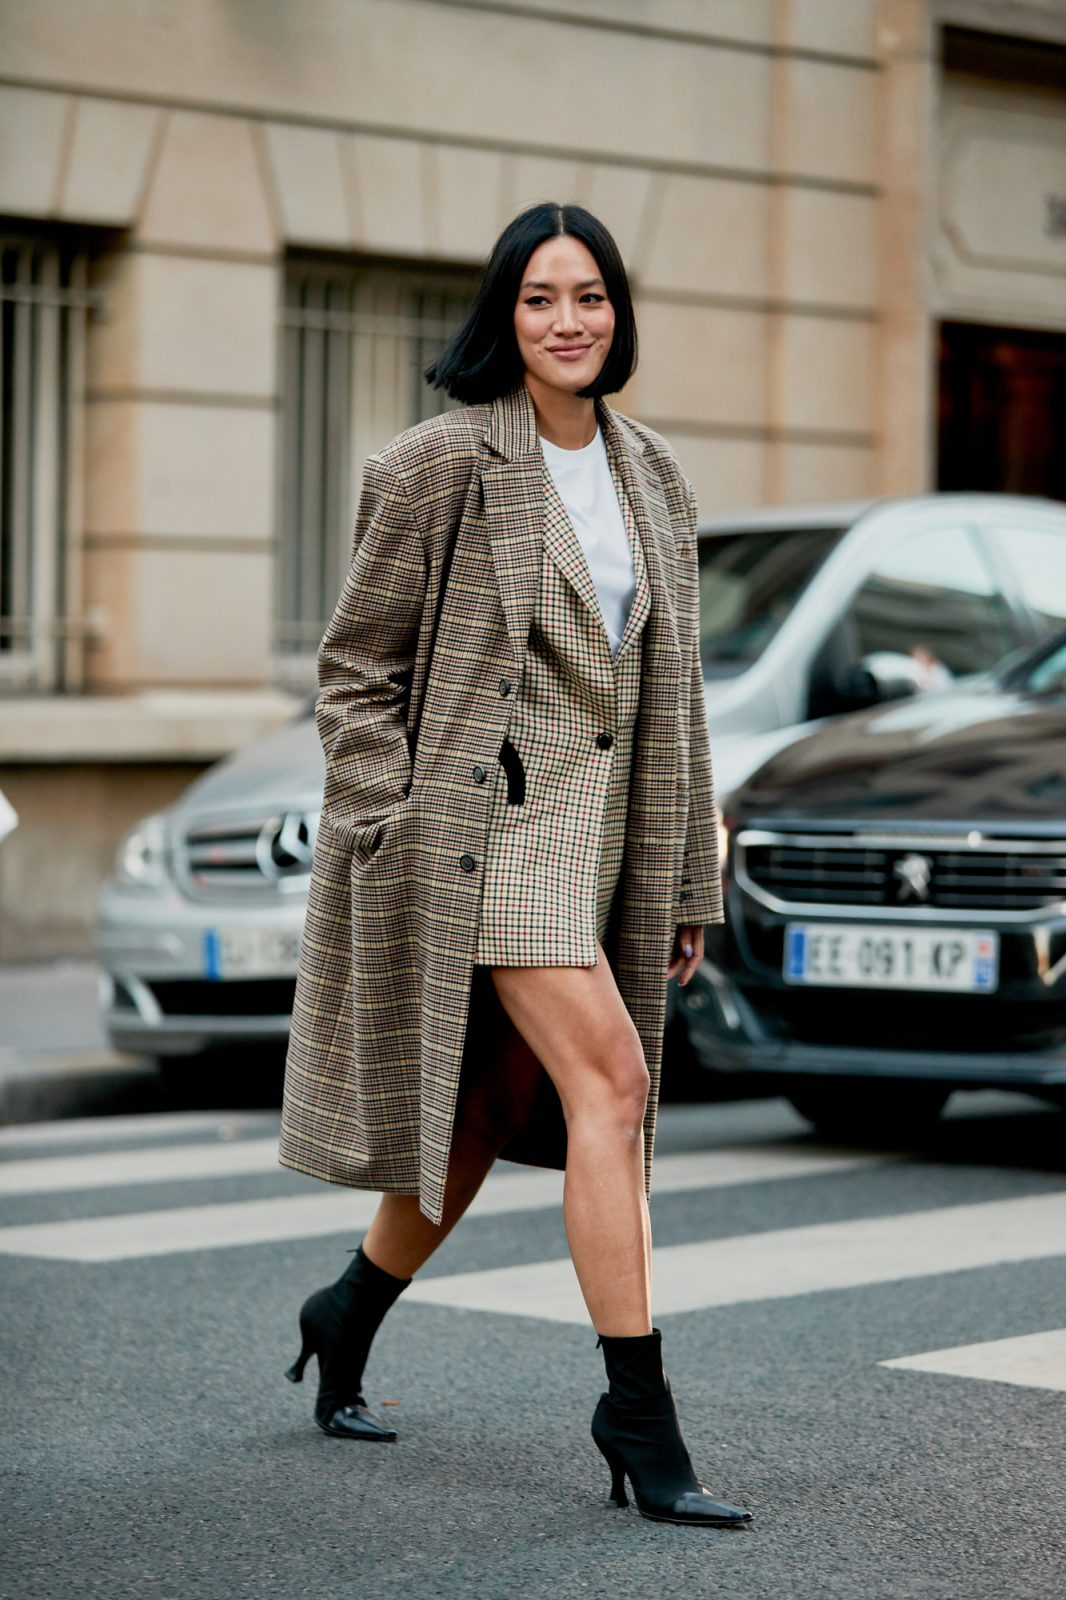 Overcoat and short dress